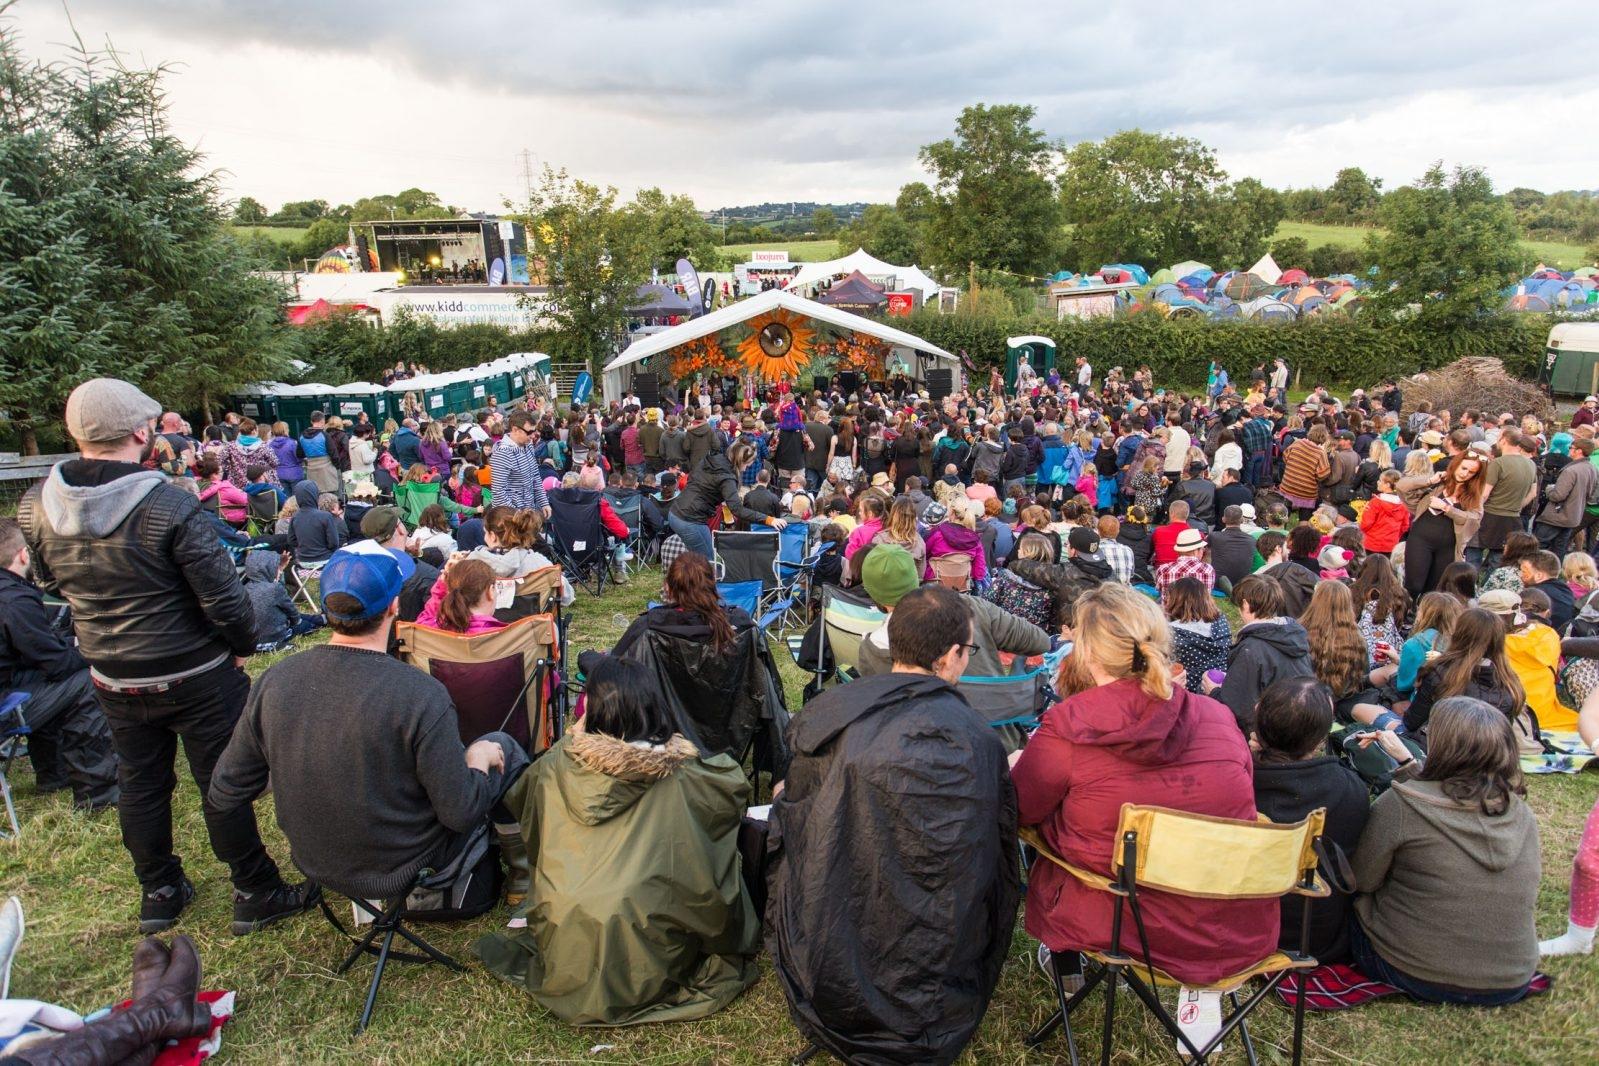 Sunflowerfest 2017, Sunflowerfest 2018, Tubby's Farm, Hillsborough, CMcGuigan Photography, Chris McGuigan Photography, Festival